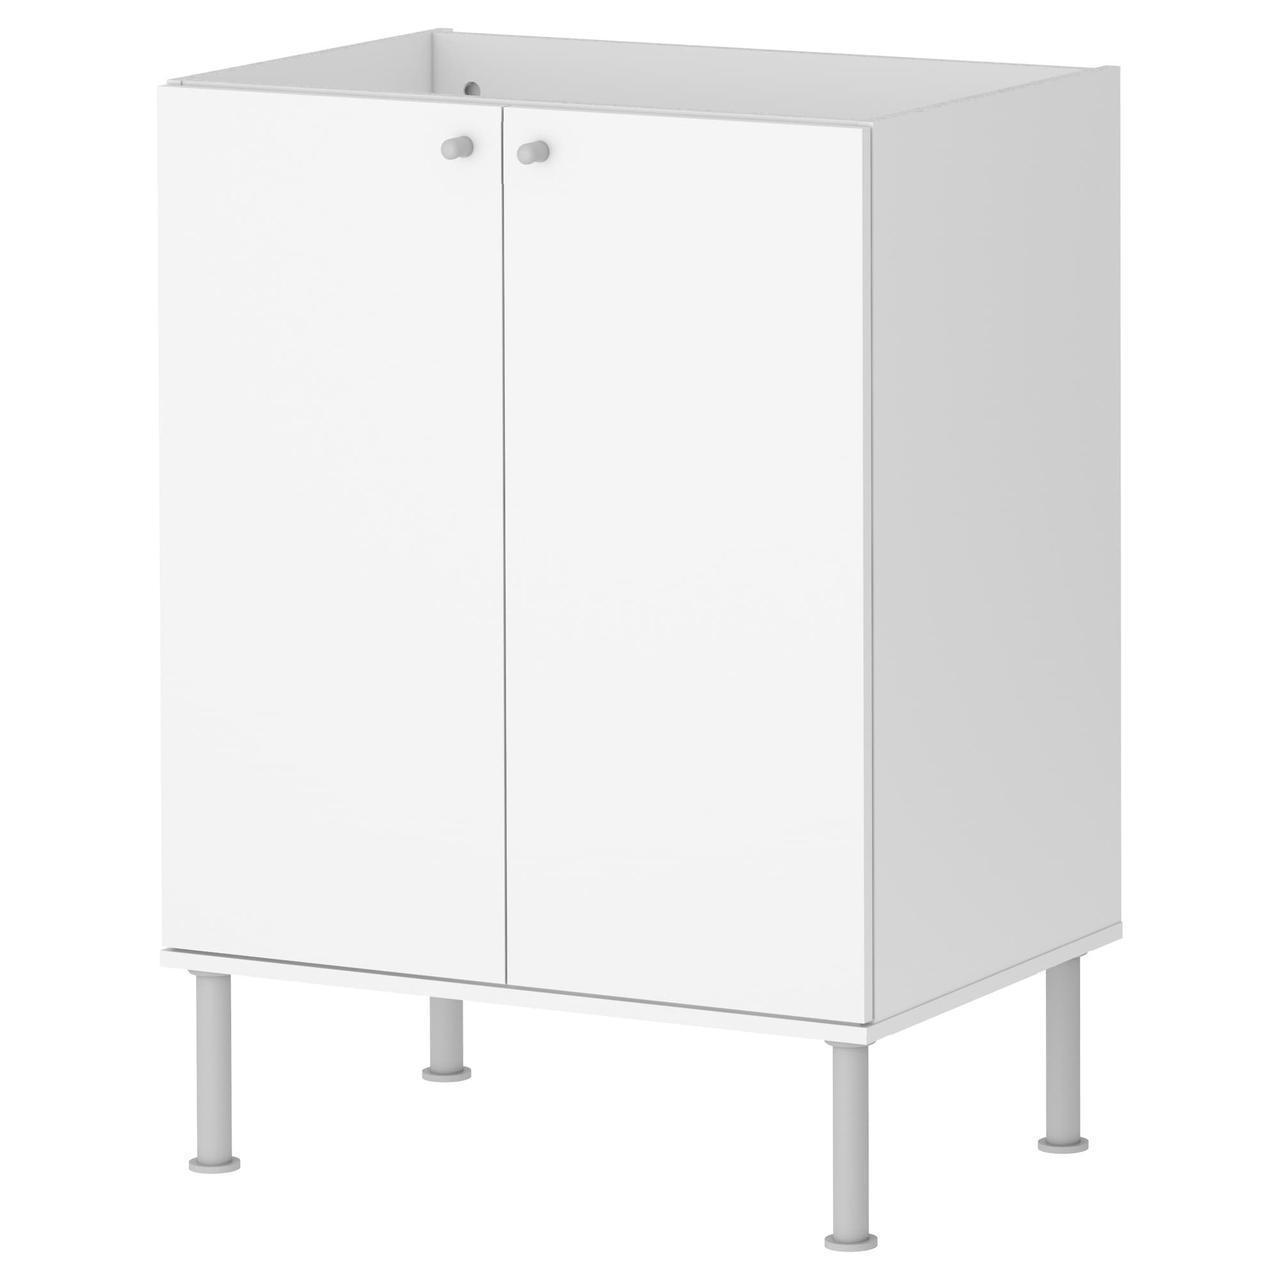 IKEA FULLEN Шкаф для раковины, белый  (701.890.41)